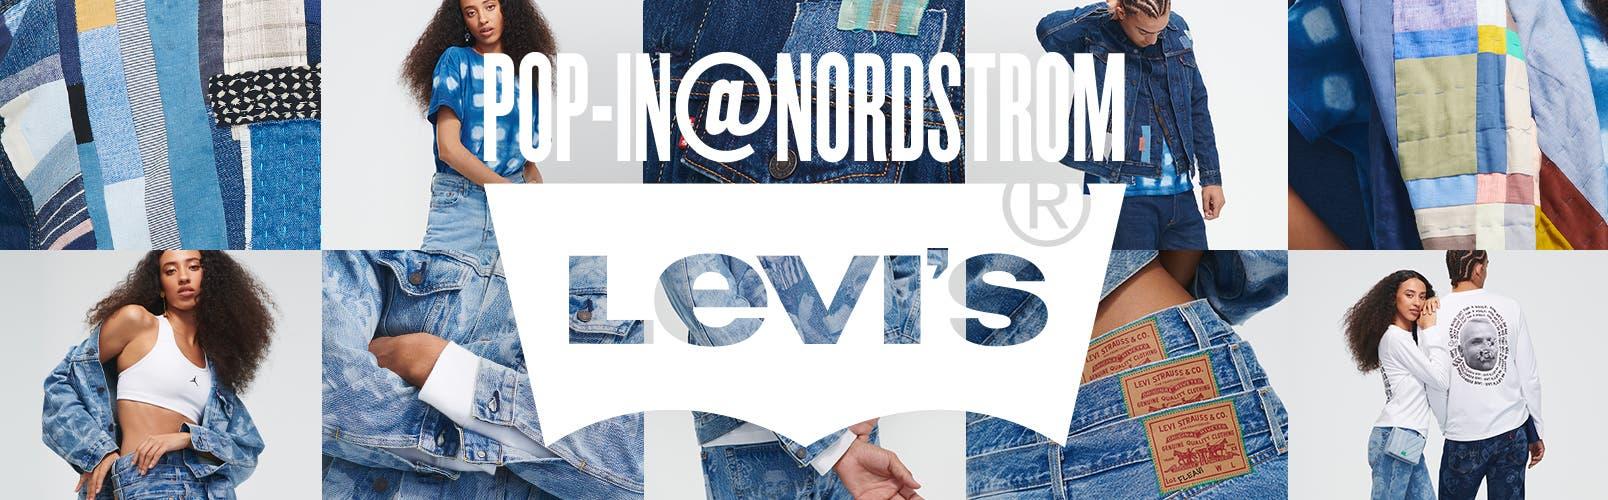 Pop-In@Nordstrom x Levi's.